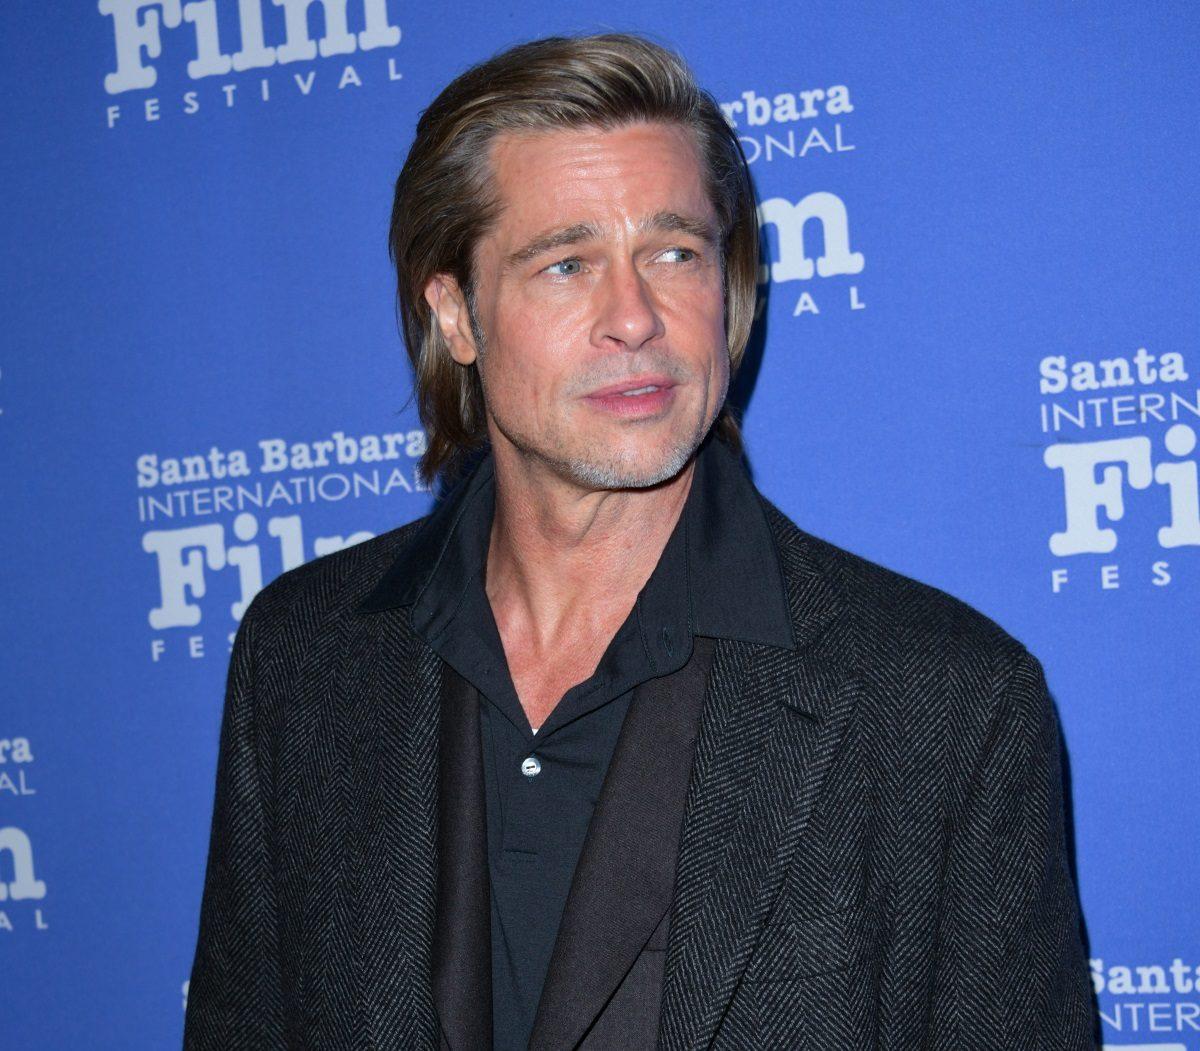 BAFTA 2020: Τα καυστικά σχόλια του Brad Pitt στον ευχαριστήριο λόγο του! Πώς σχολίασε Brexit και… Megxit [vid] | tlife.gr